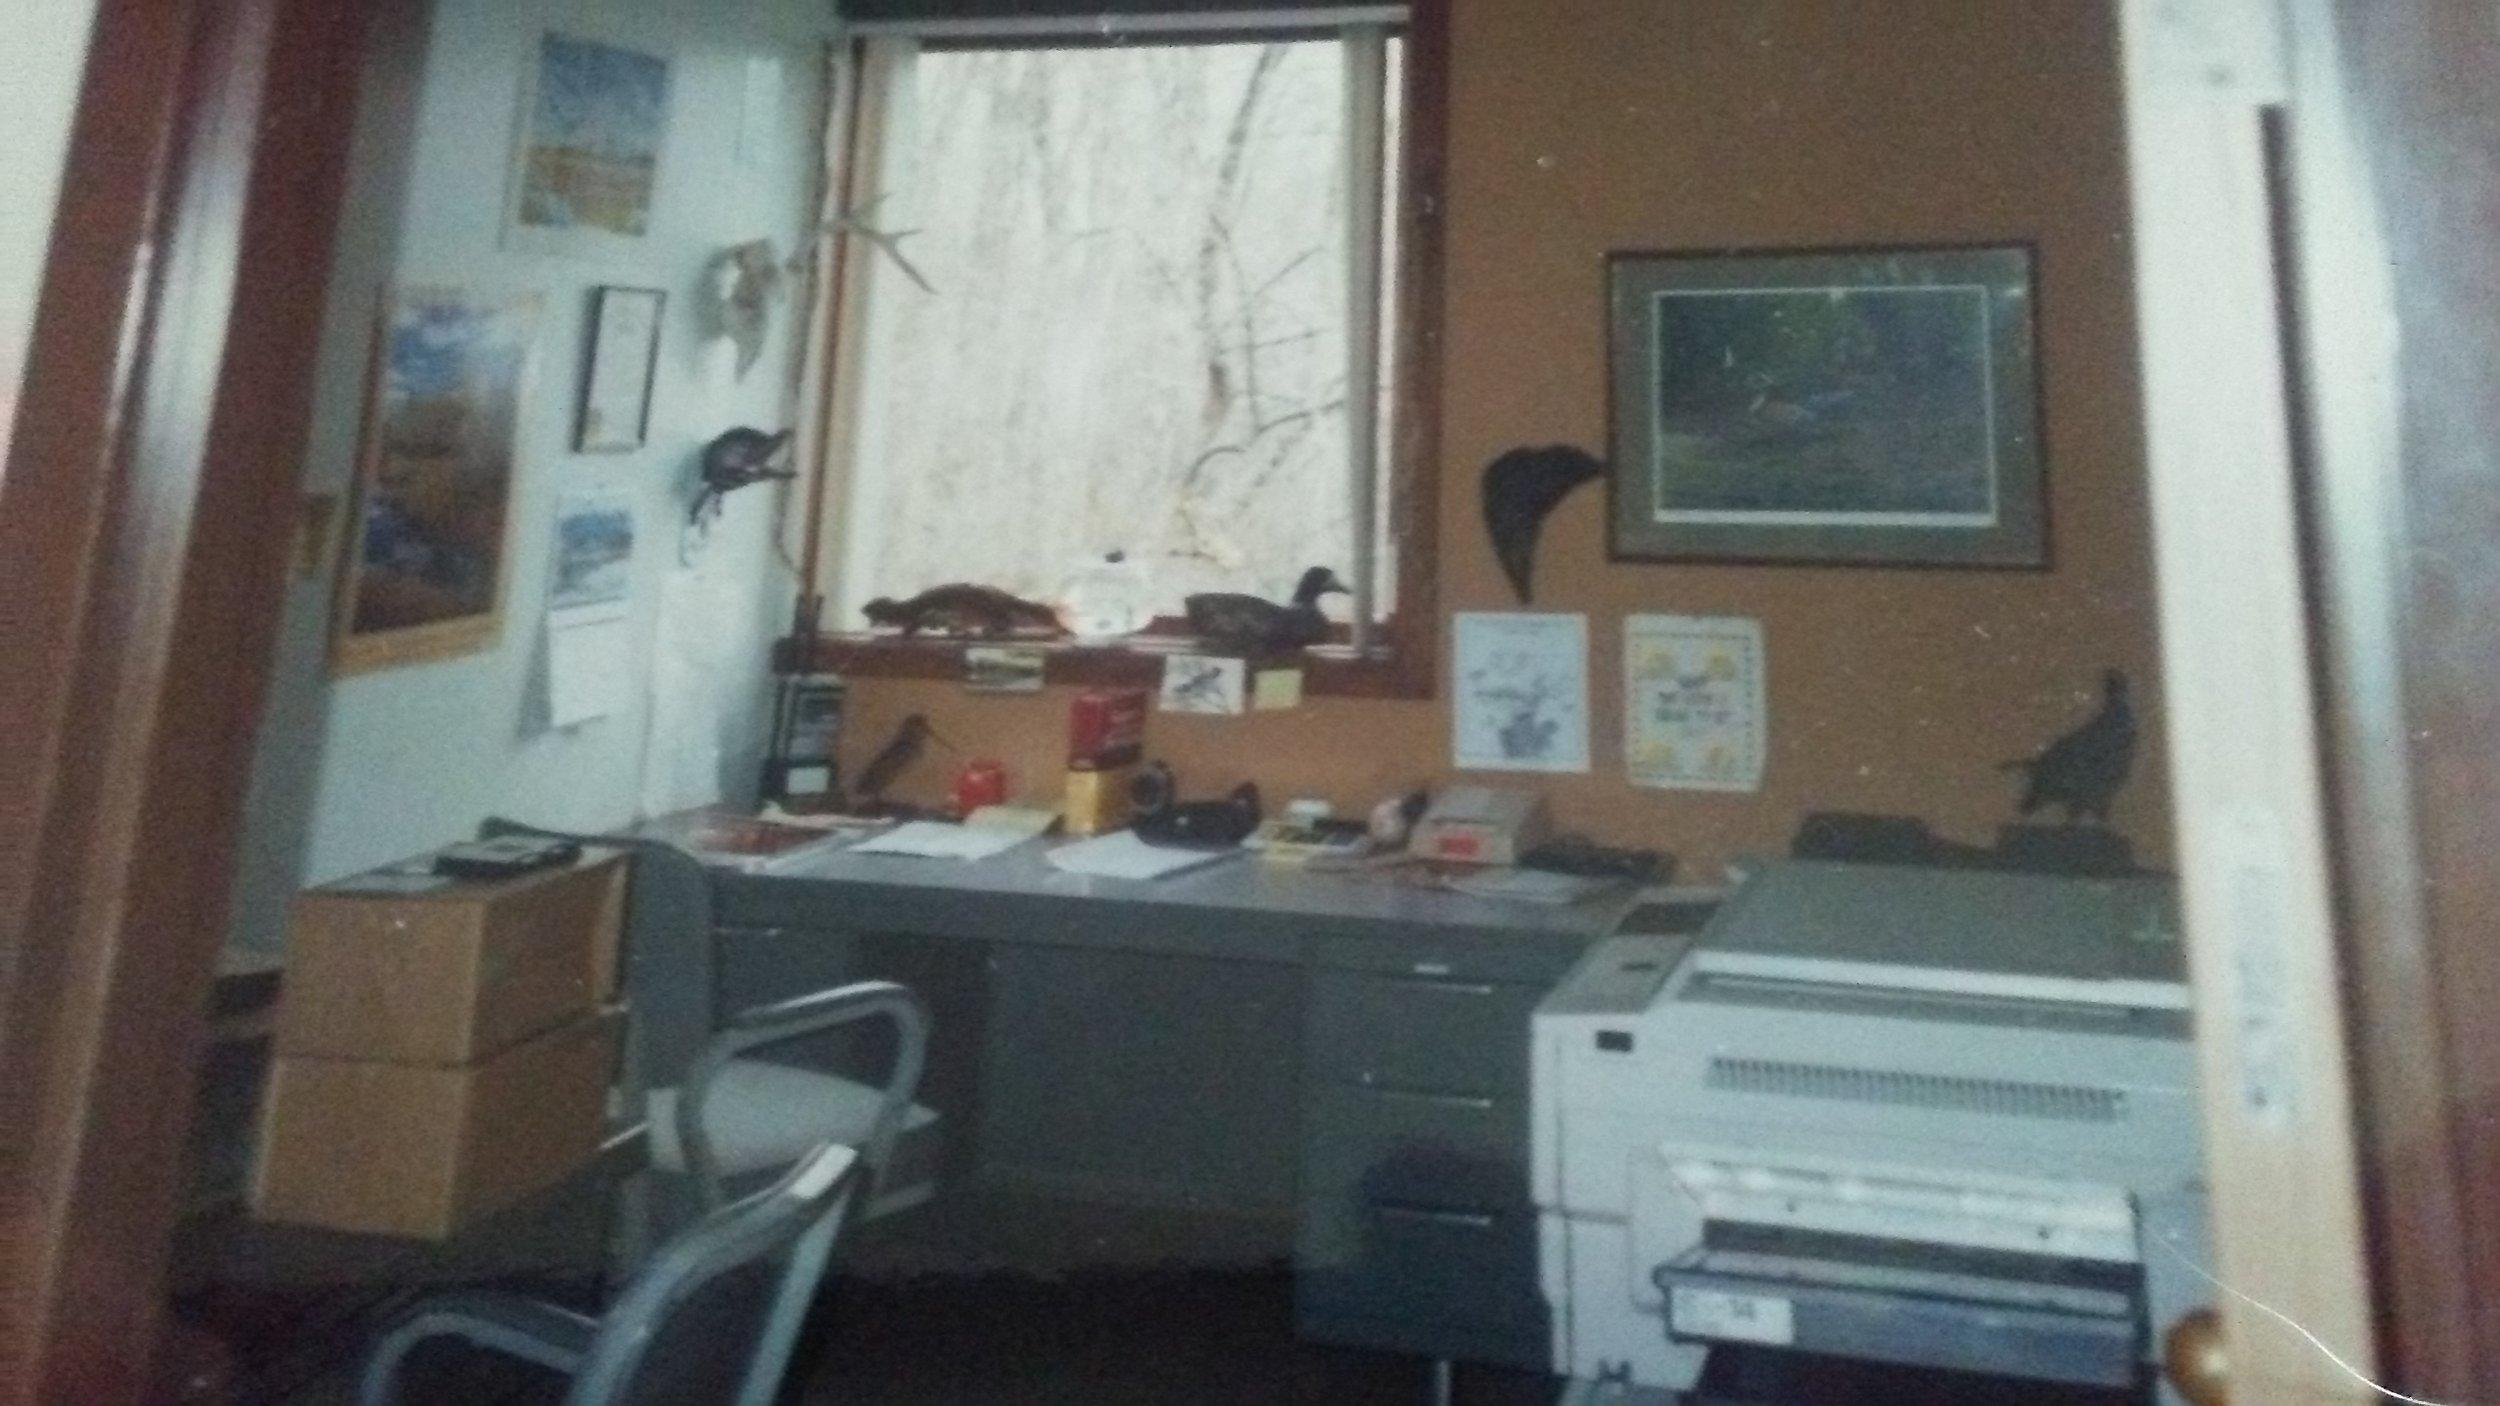 Archaeology Lab at Toledo University circa 1991